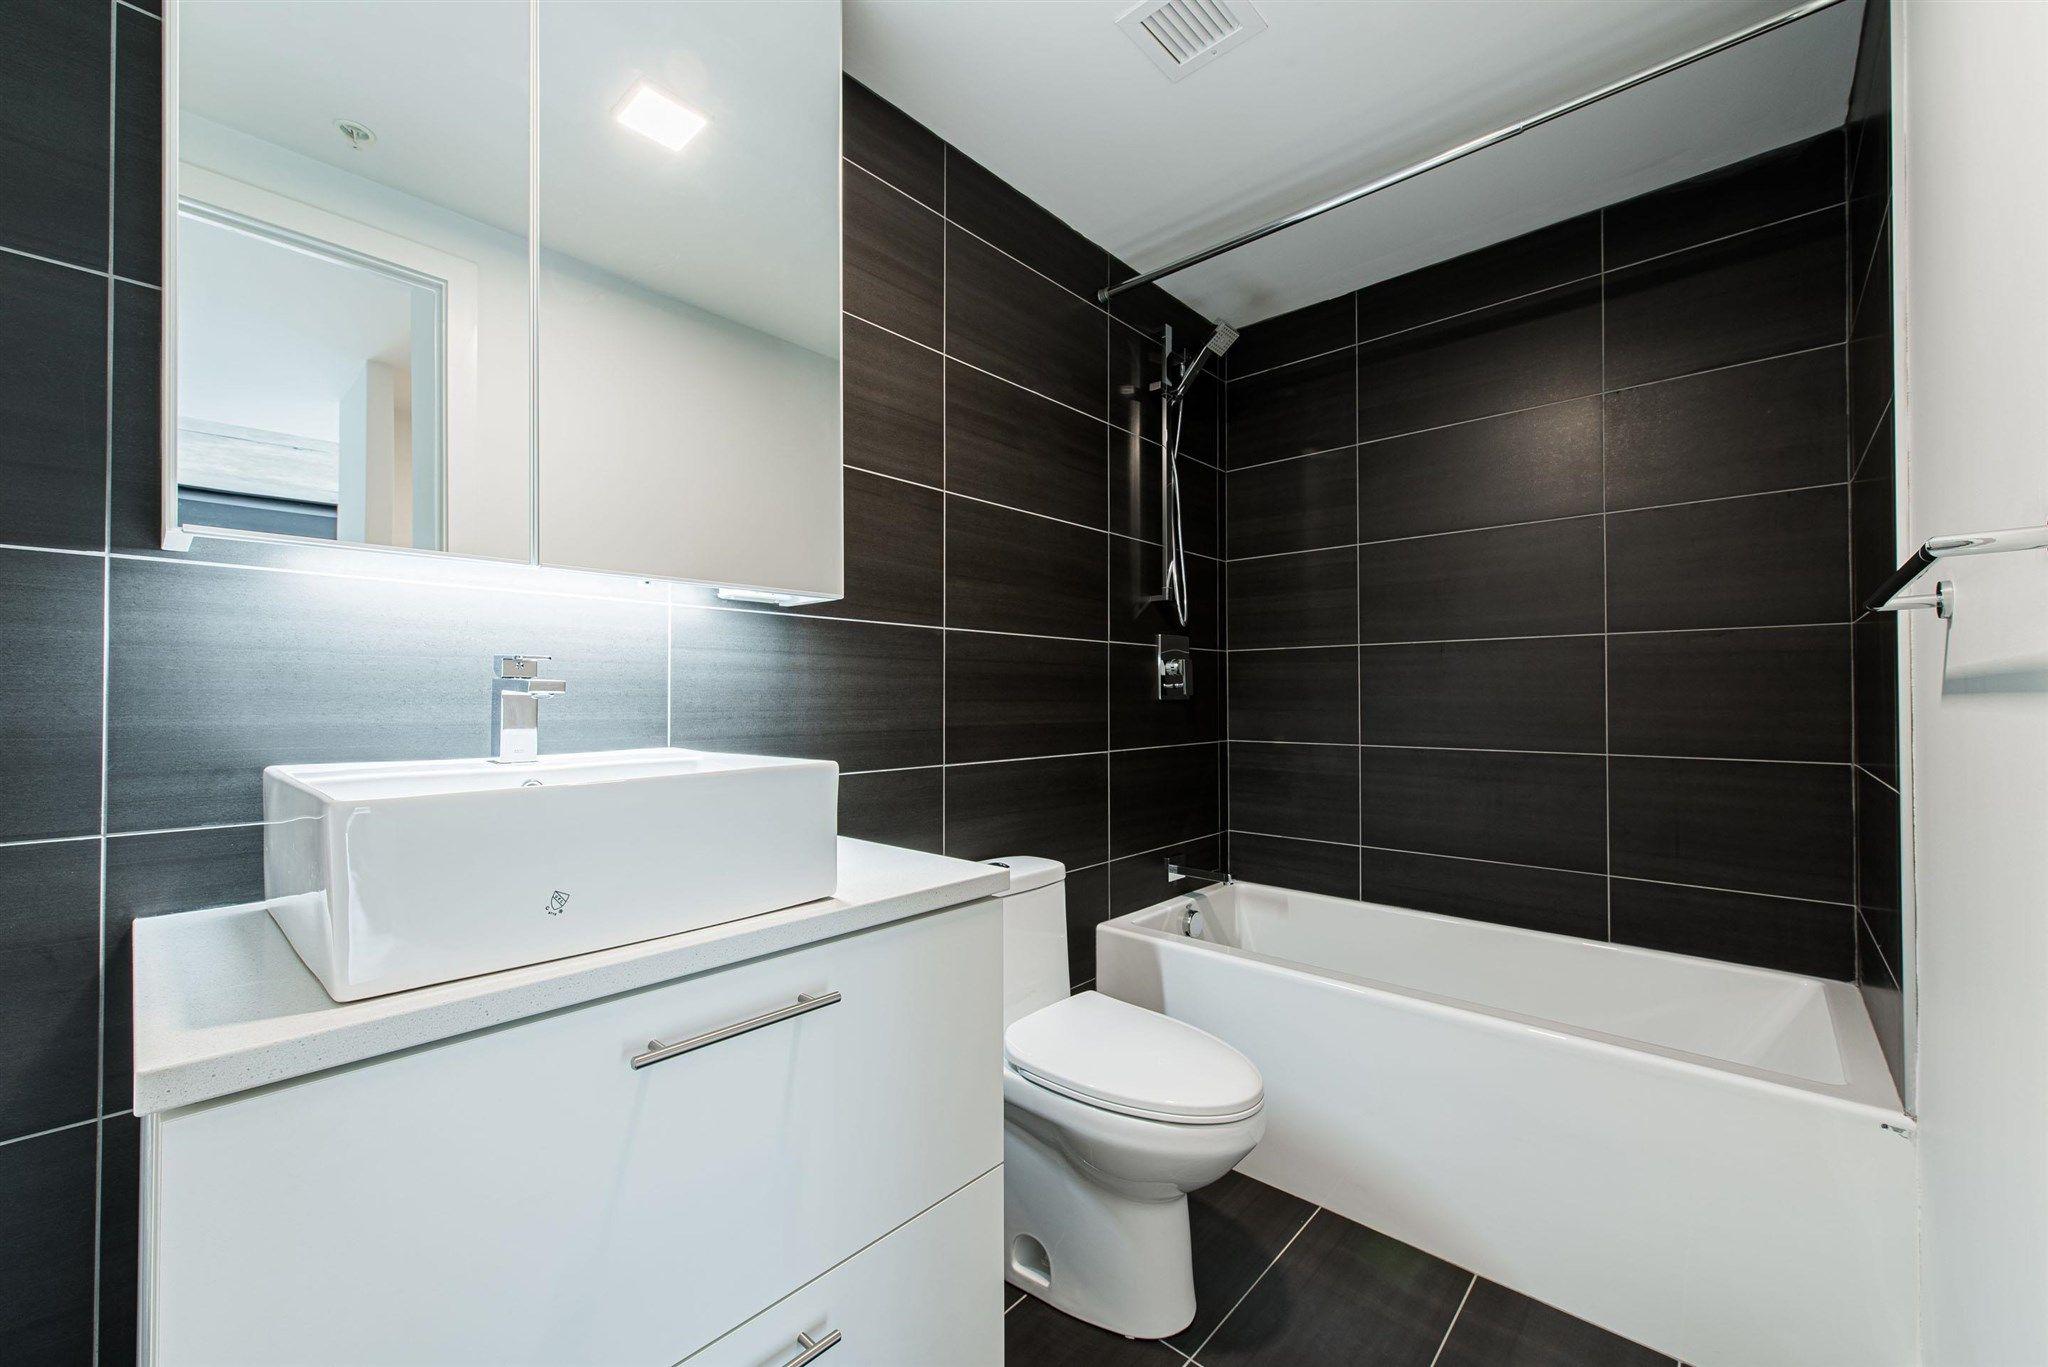 Photo 23: Photos: 105 1048 Wellington Street in Halifax: 2-Halifax South Residential for sale (Halifax-Dartmouth)  : MLS®# 202100816